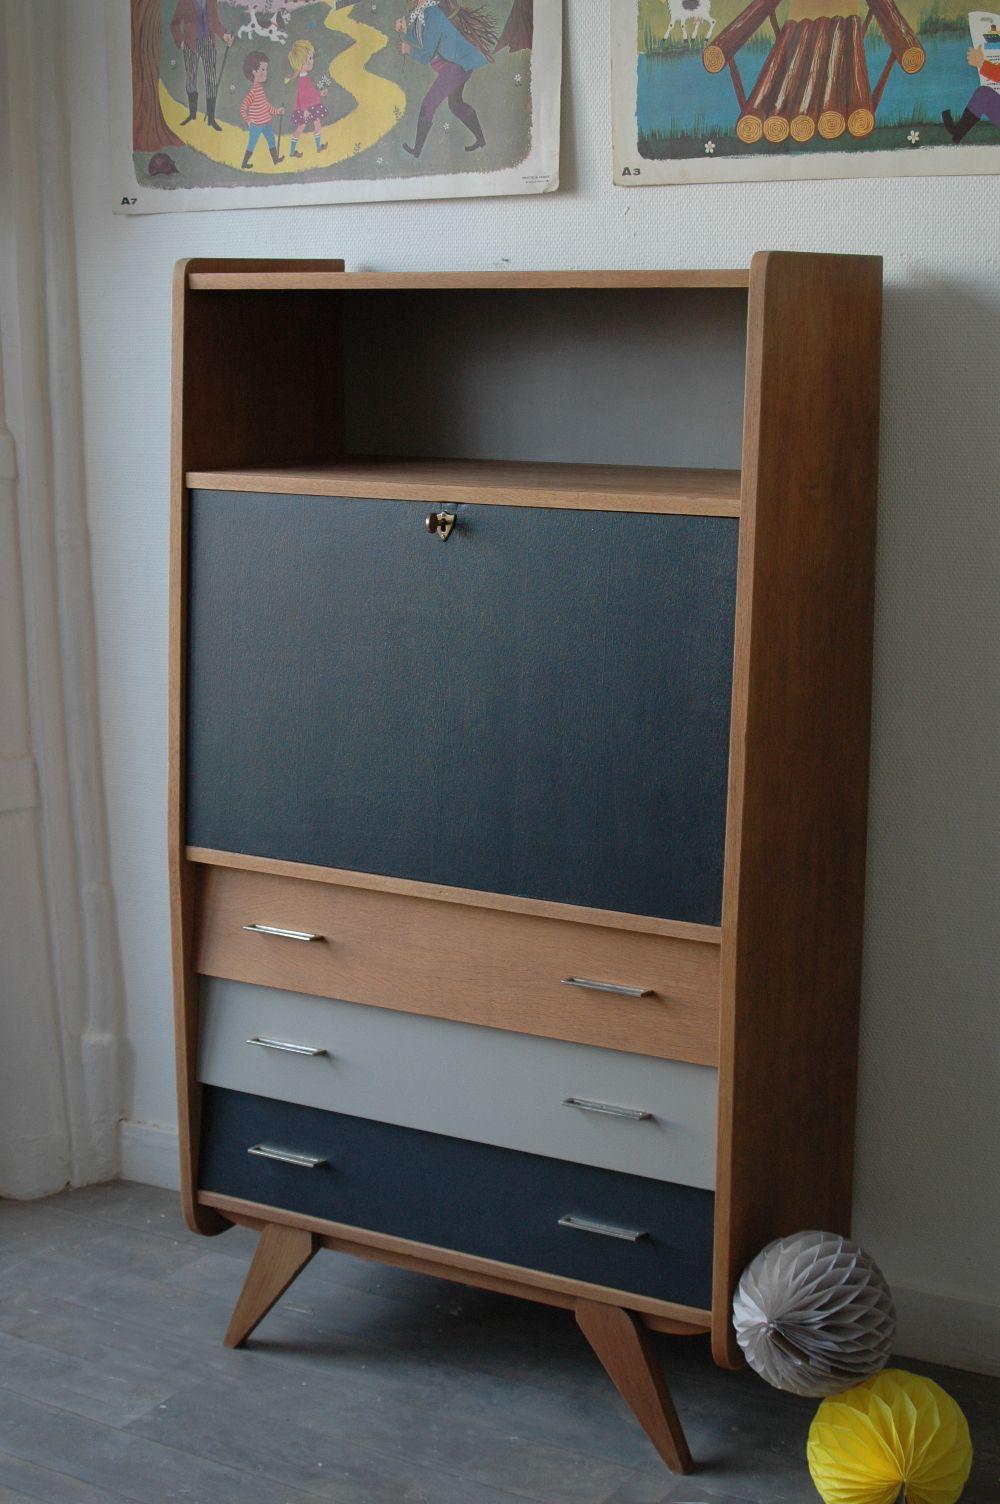 secr taire vintage recherche google diy pinterest loft furniture home renovation et. Black Bedroom Furniture Sets. Home Design Ideas